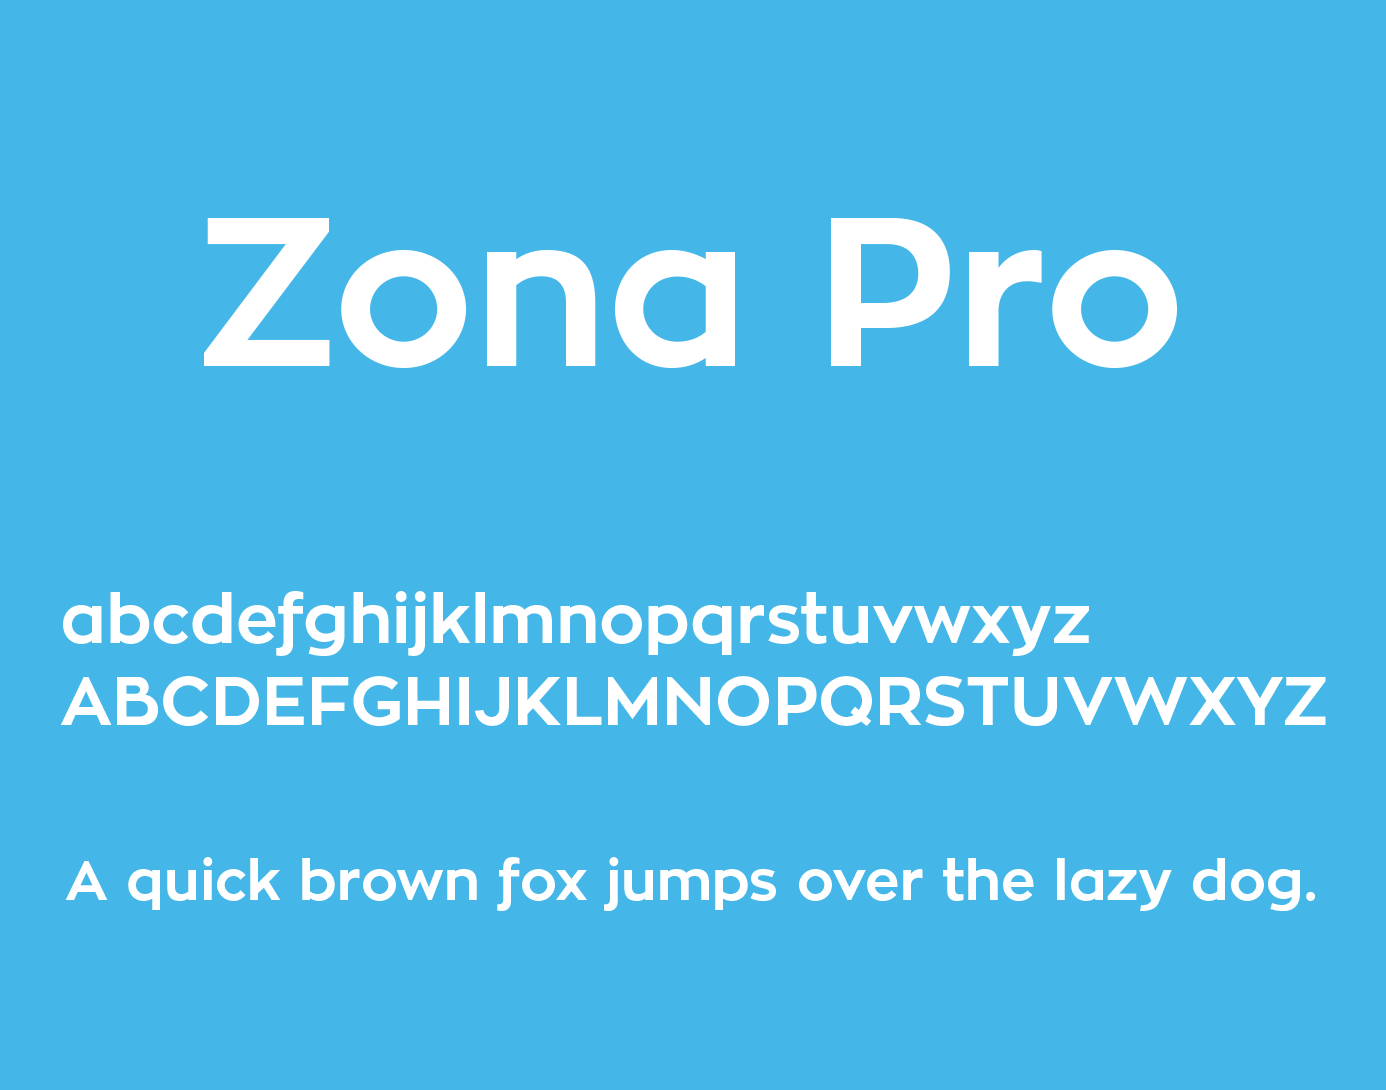 zona-pro-font